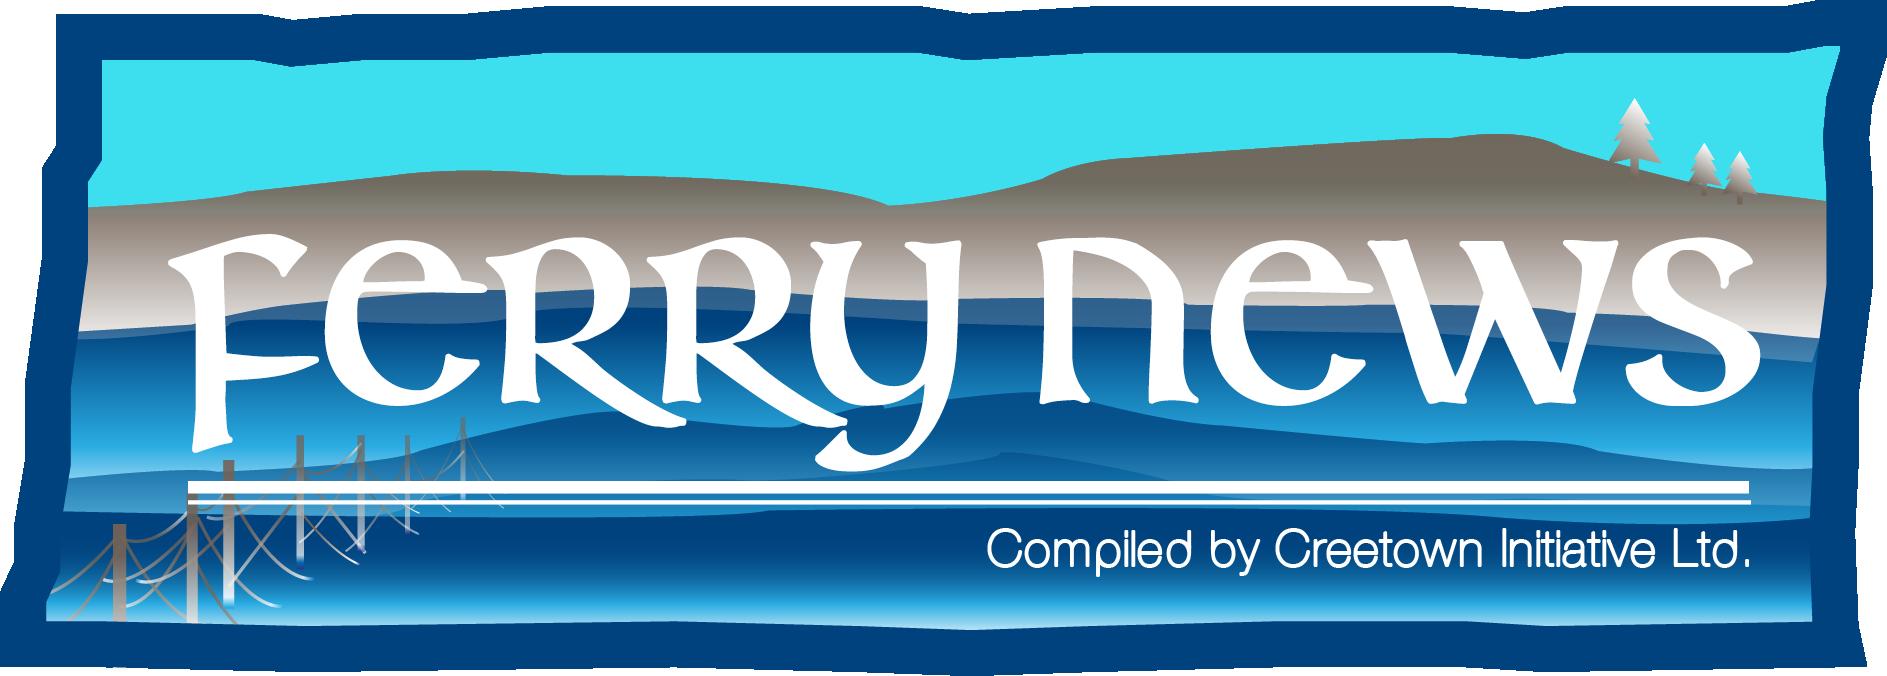 Ferry News Logo